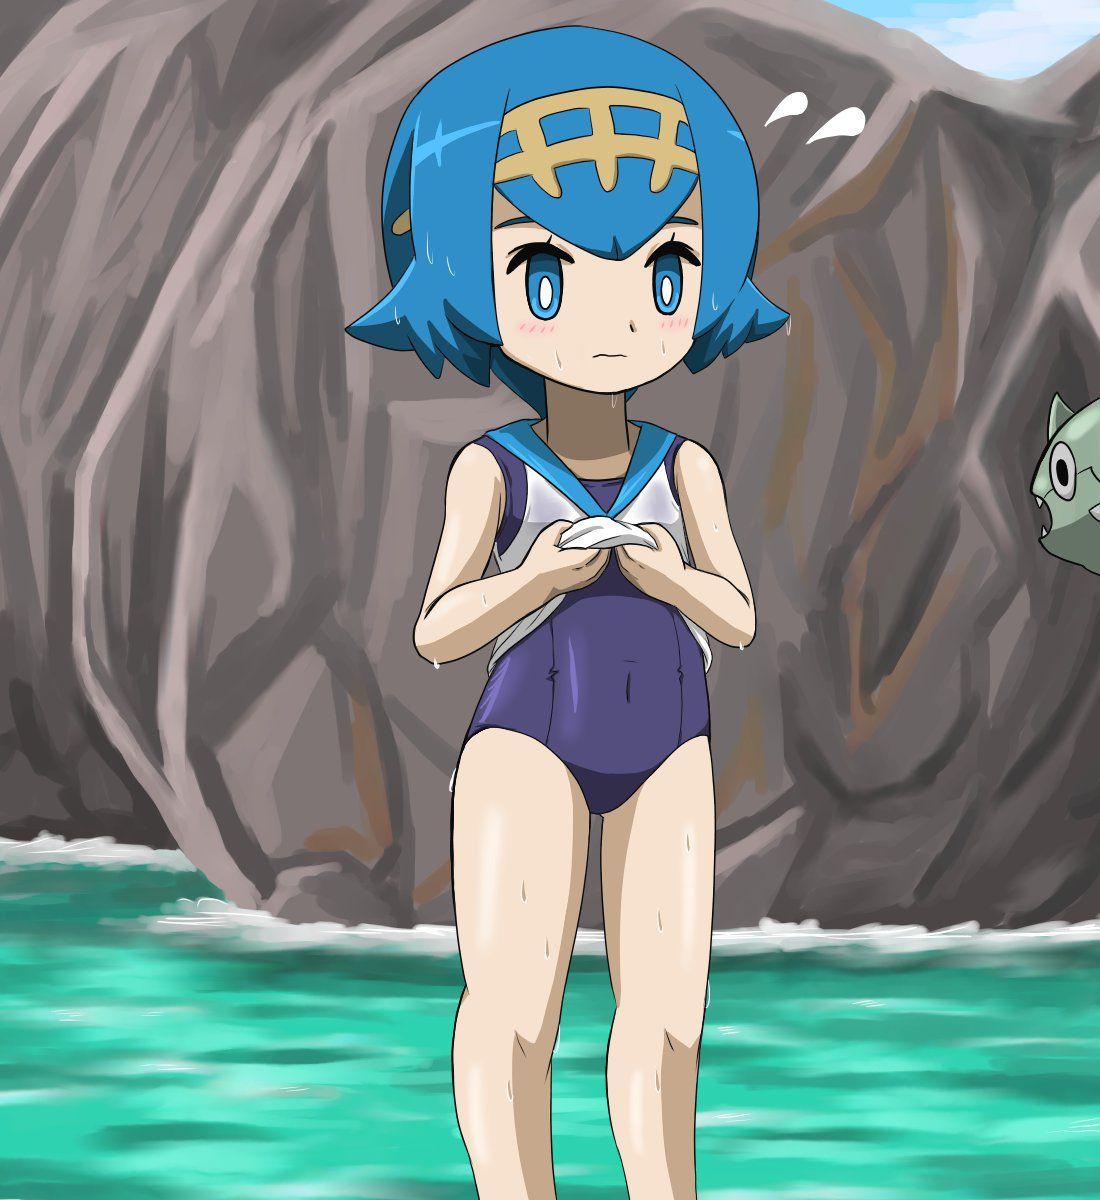 lana_(pokemon)005